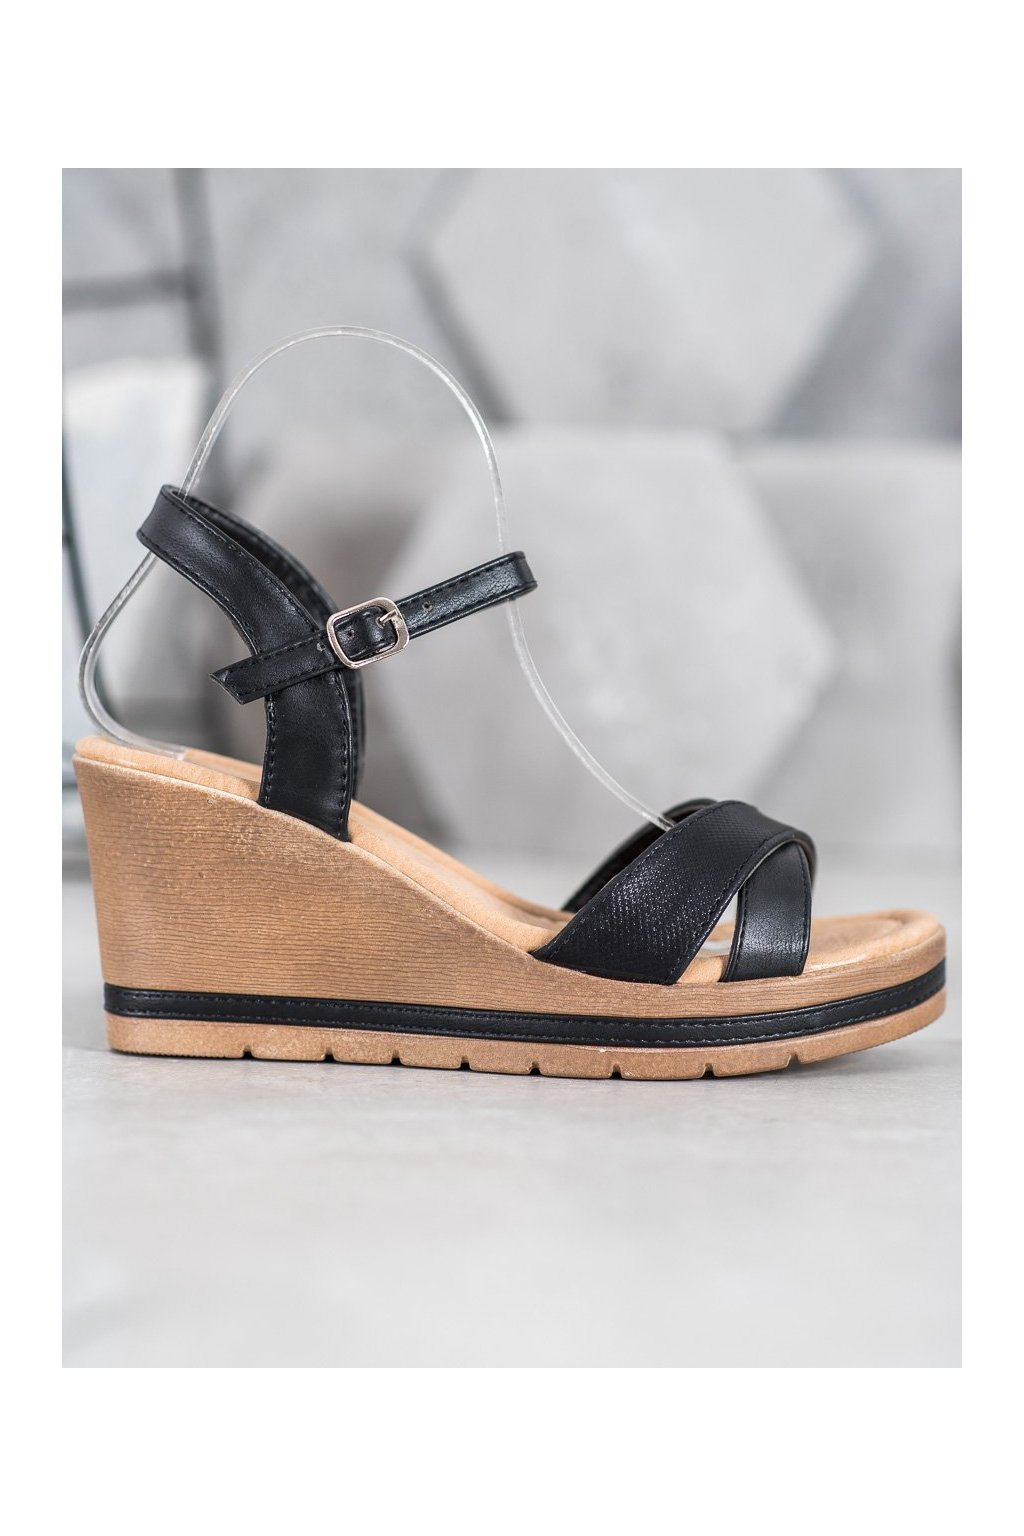 Čierne sandále Sea elves NJSK 6437B